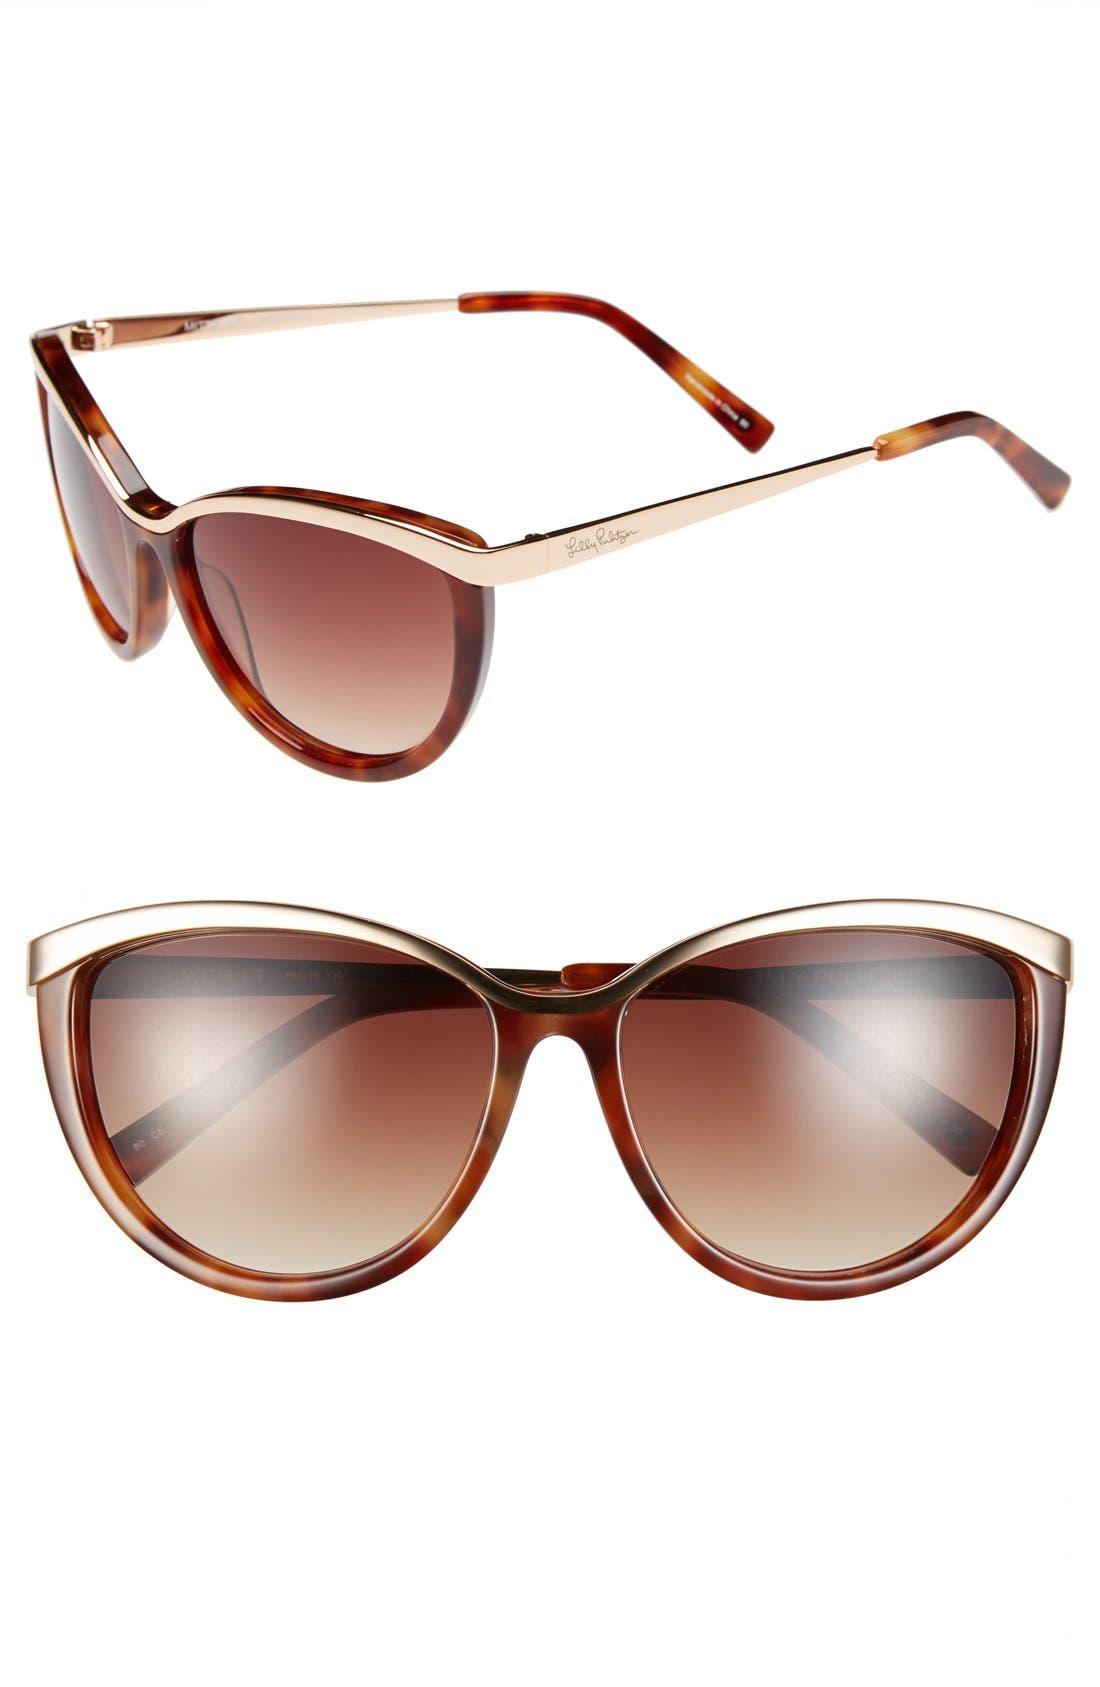 Main Image - Lilly Pulitzer® 'Mittie' 56mm Cat Eye Sunglasses